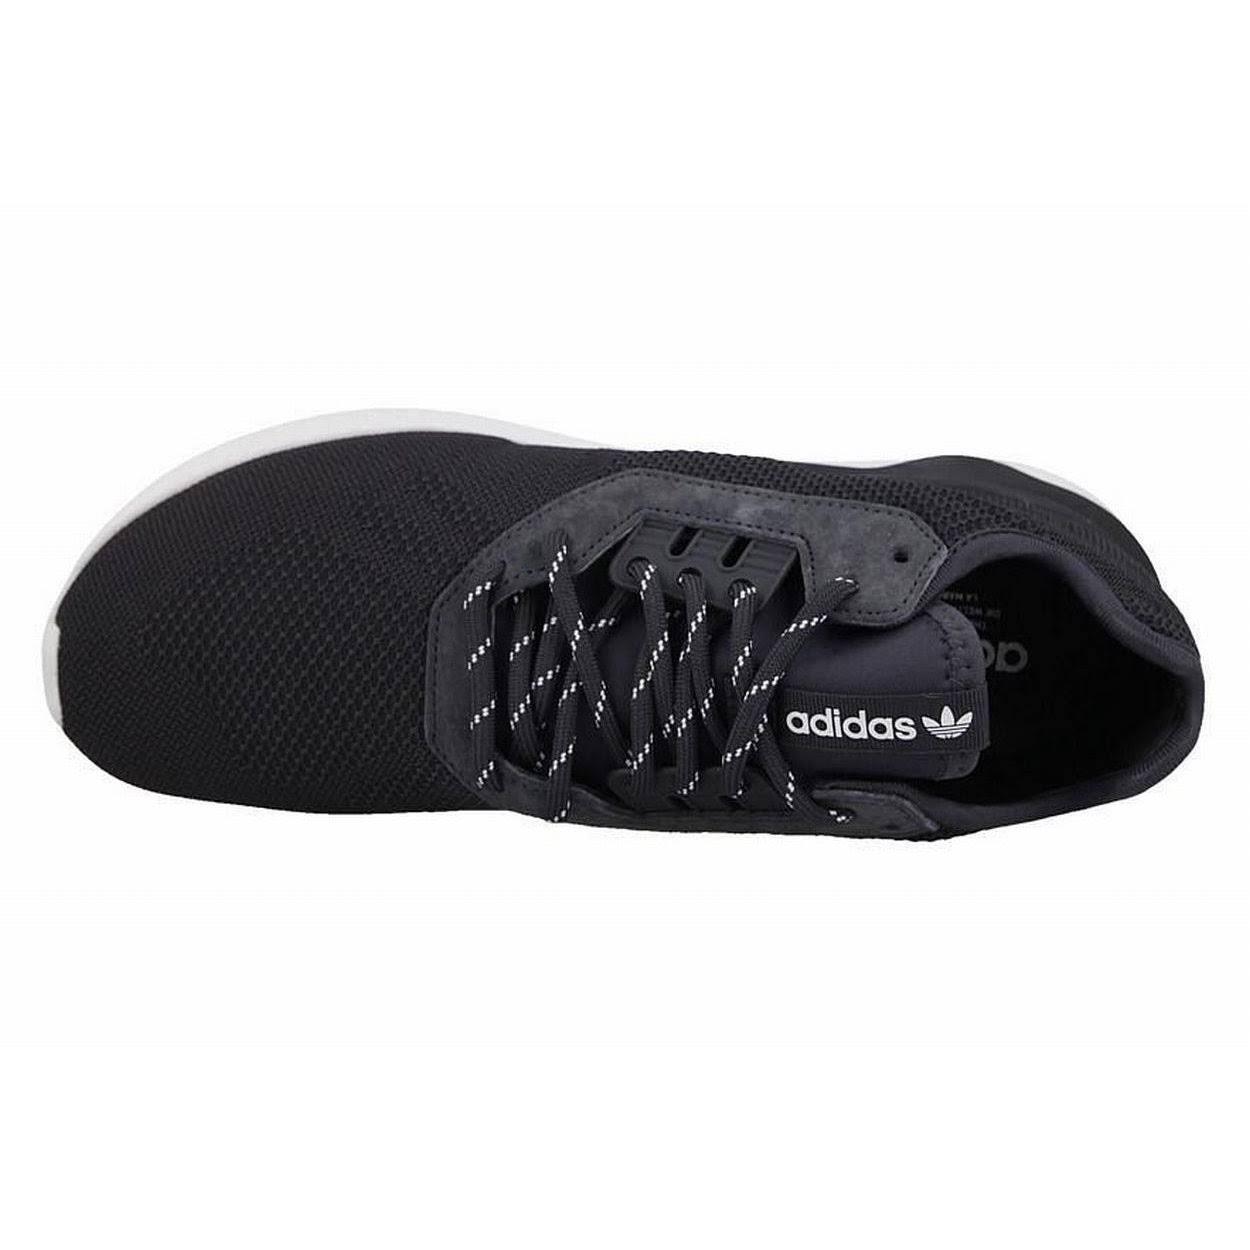 (7.5 UK) adidas Originals Men's Tubular Runner Weave Trainers Carbon